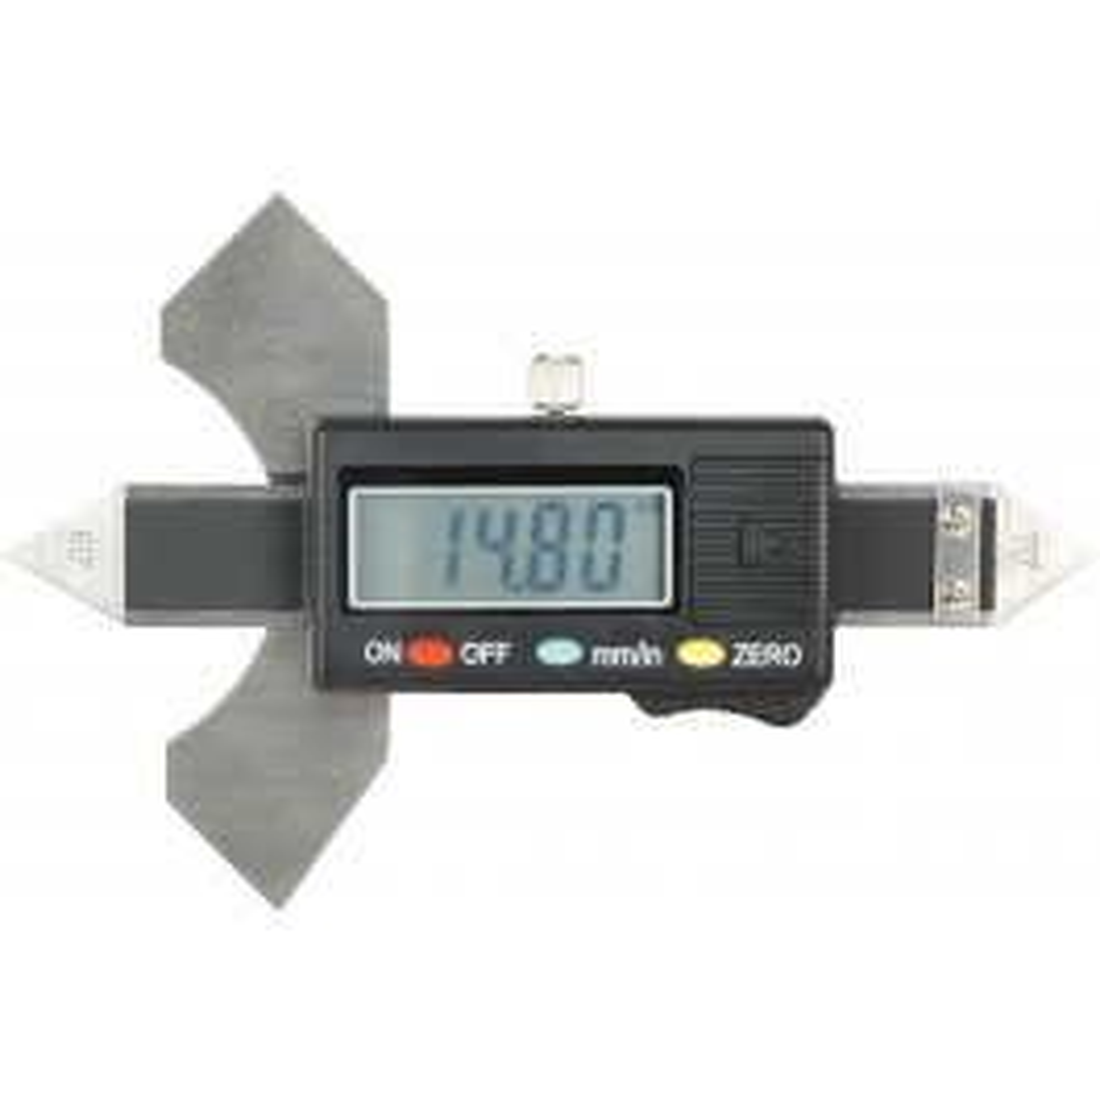 Welding seam gauge 'Precision des. - Digital'